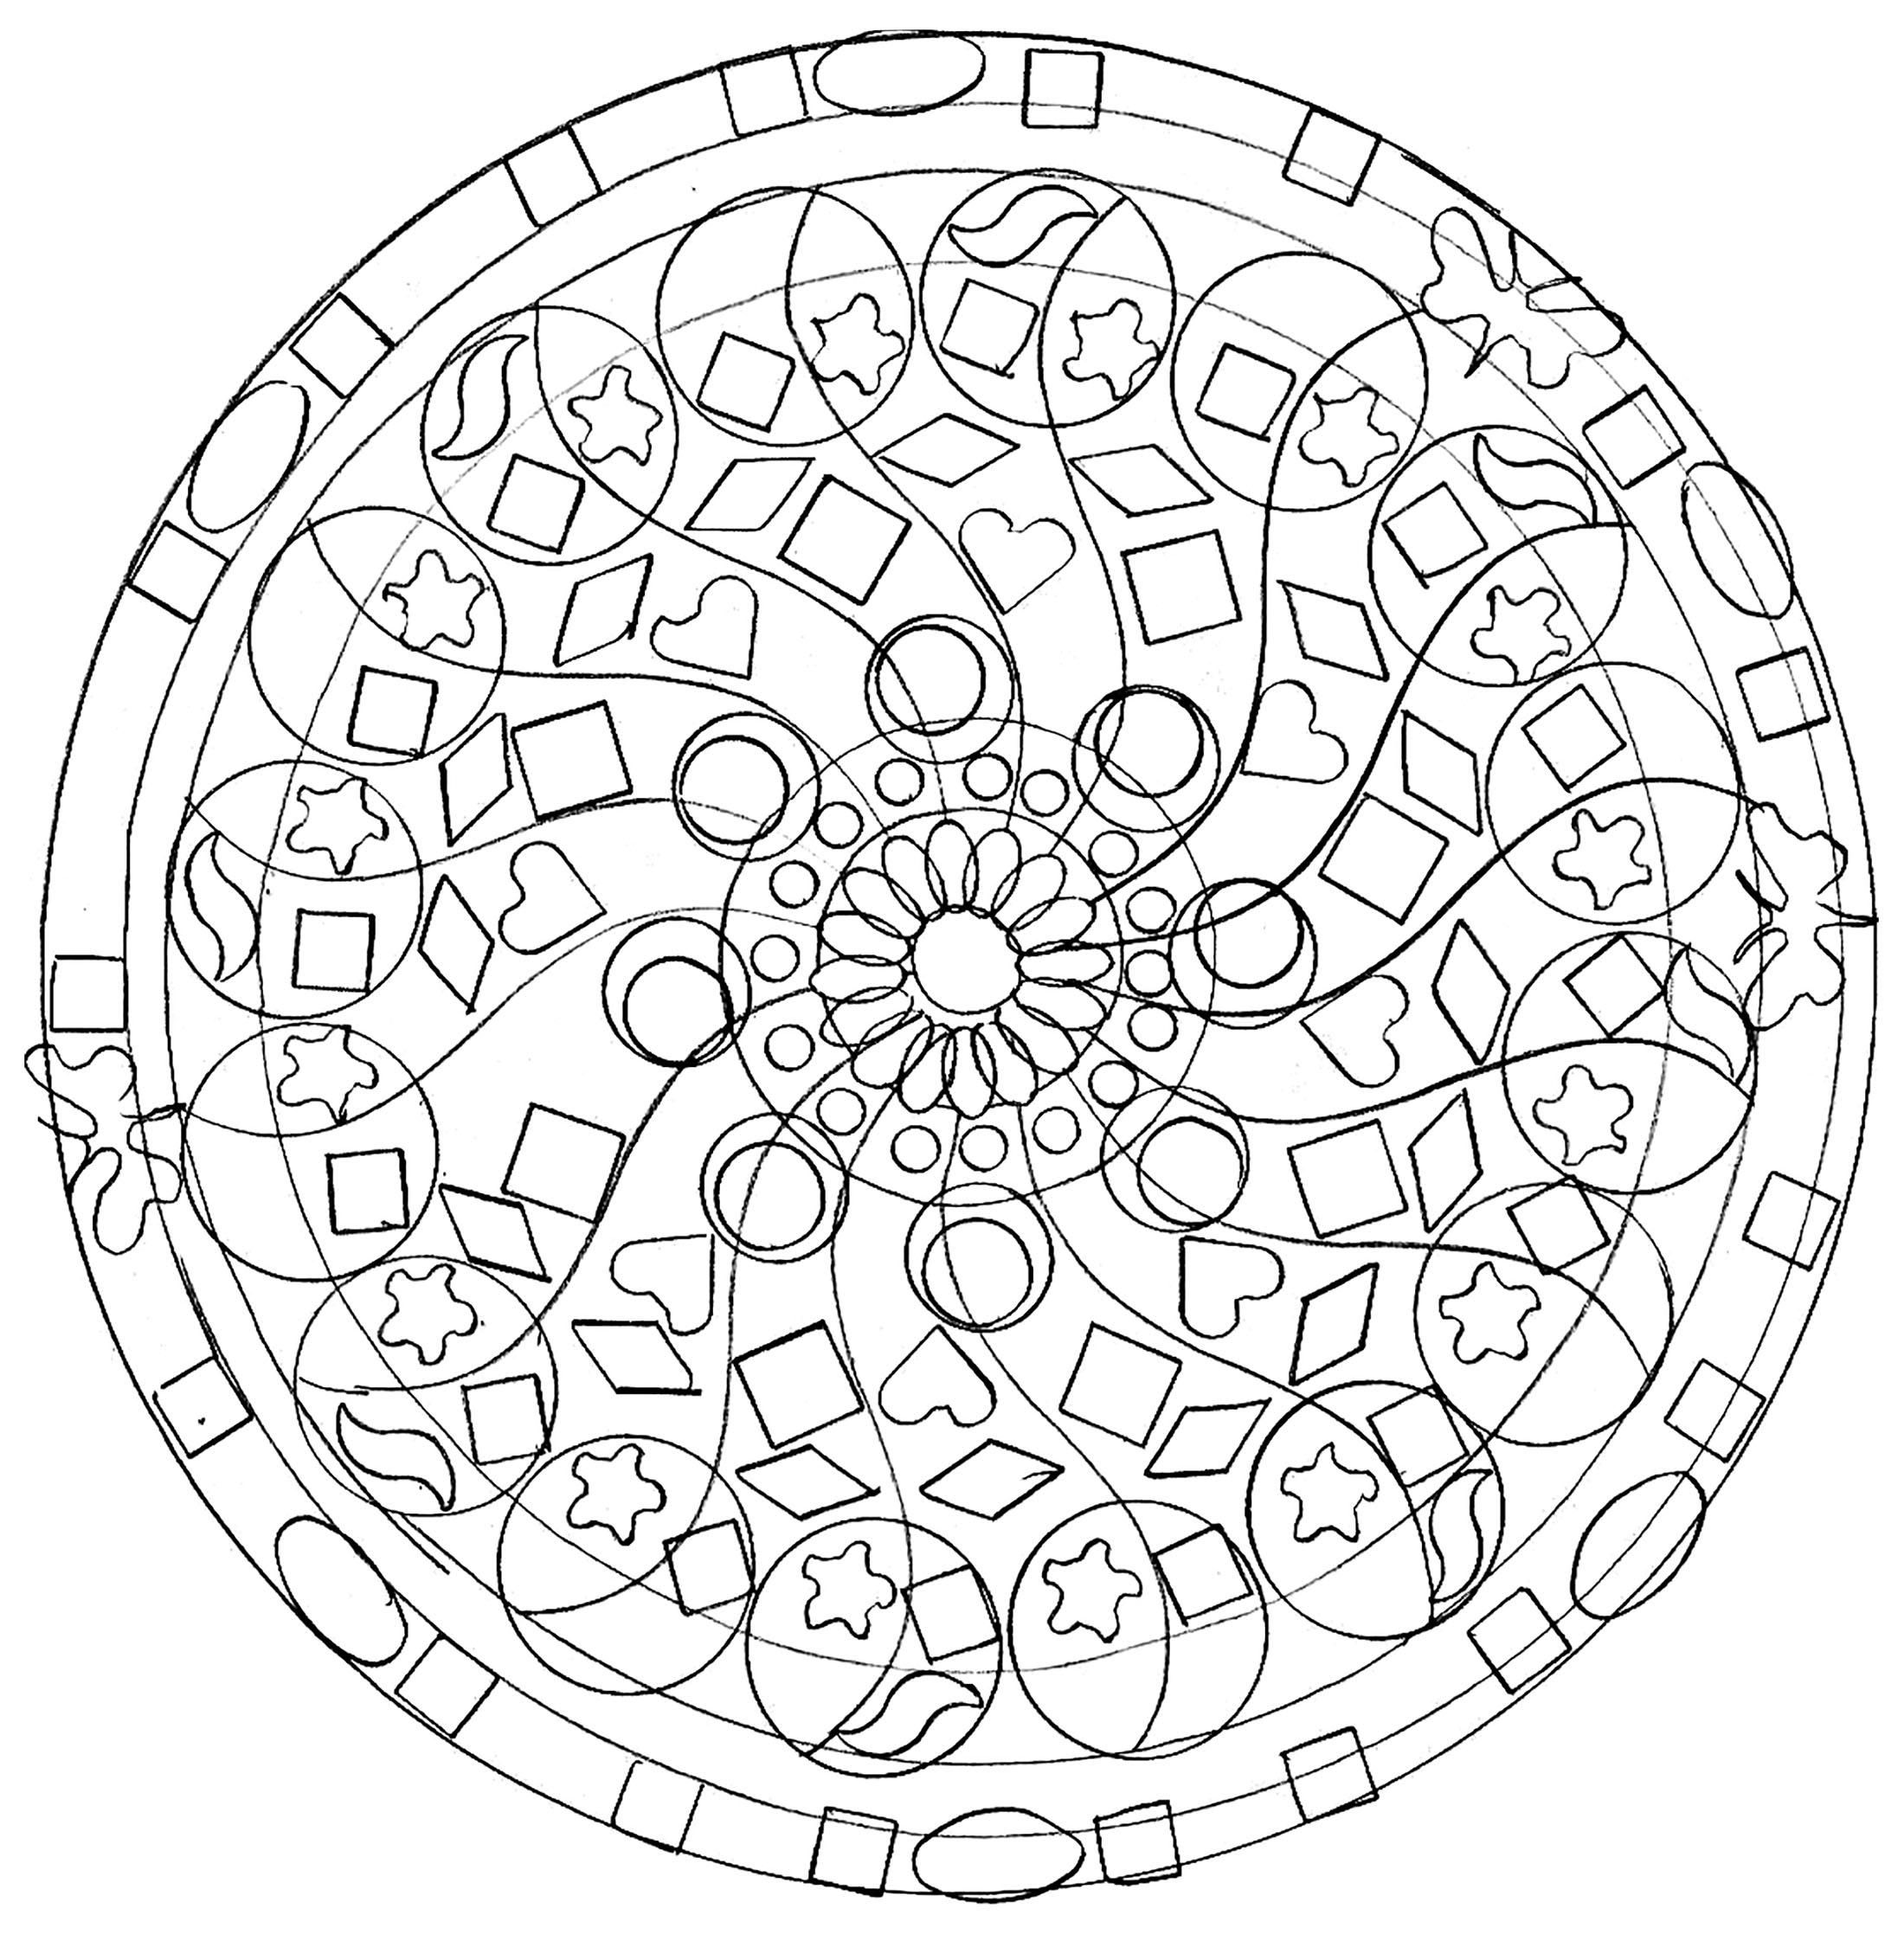 Mandala For Kids Hand Drawn Easy Mandalas For Kids 100 Mandalas